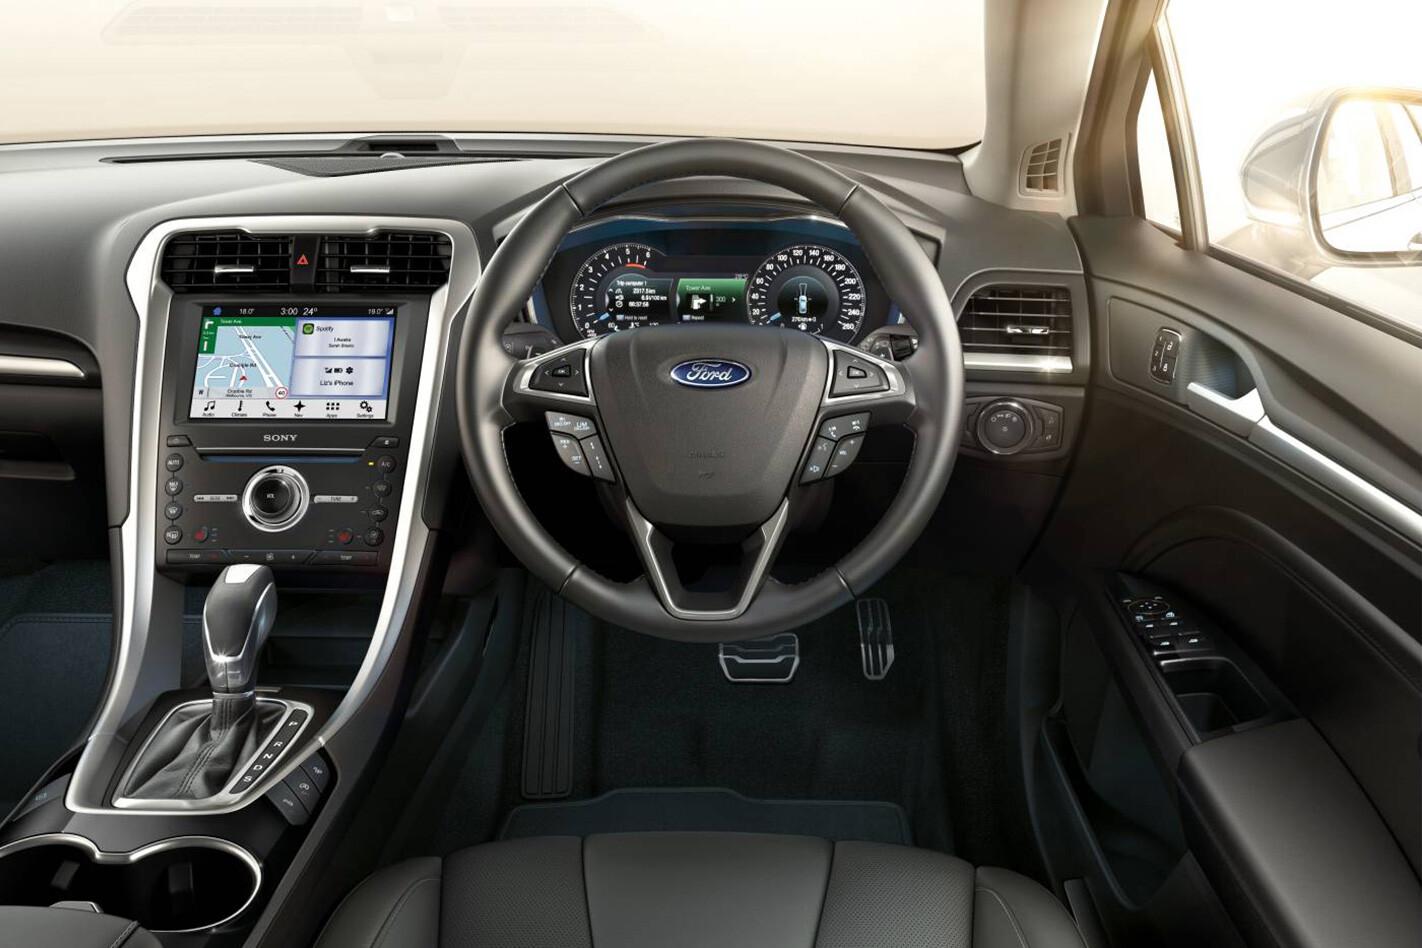 Ford Mondeo Interior Jpg